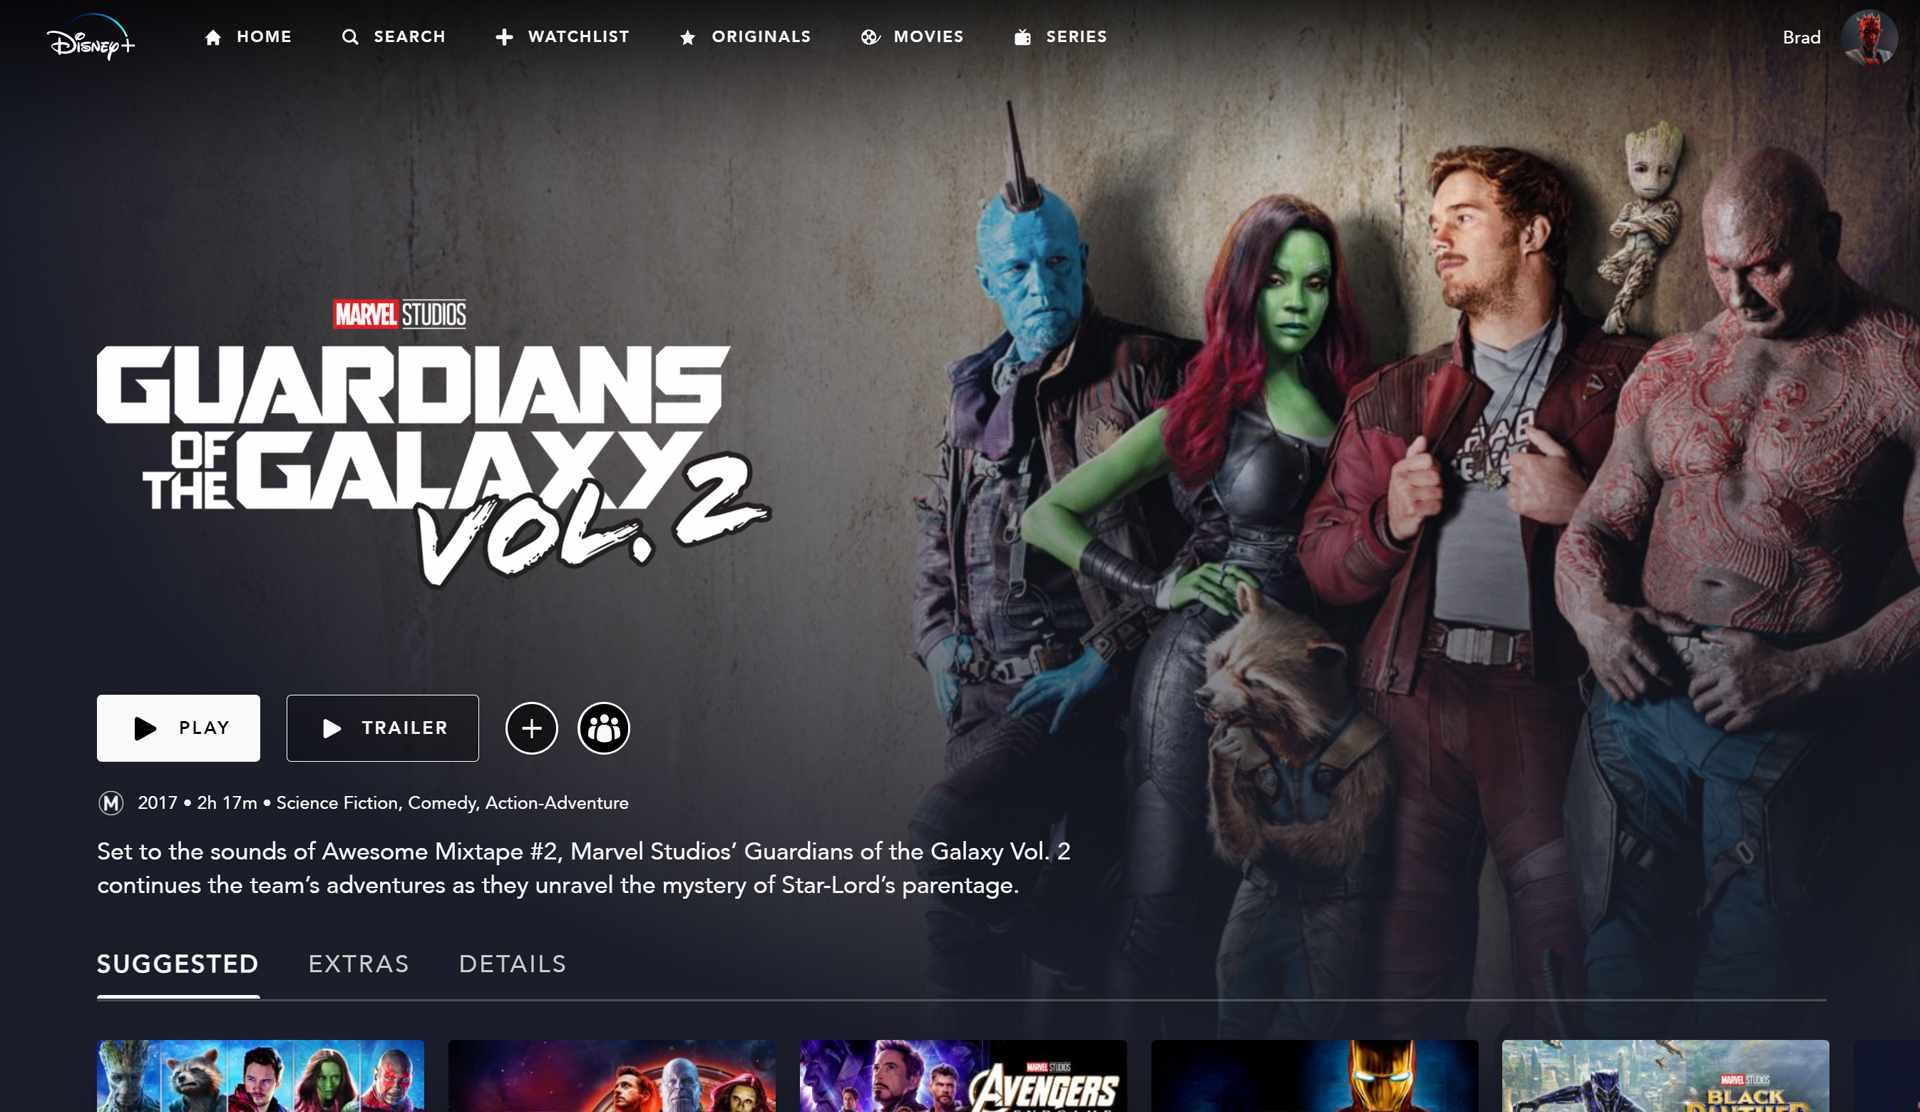 Marvel's Guardians of the Galaxy Vol 2 movie on Disney Plus.